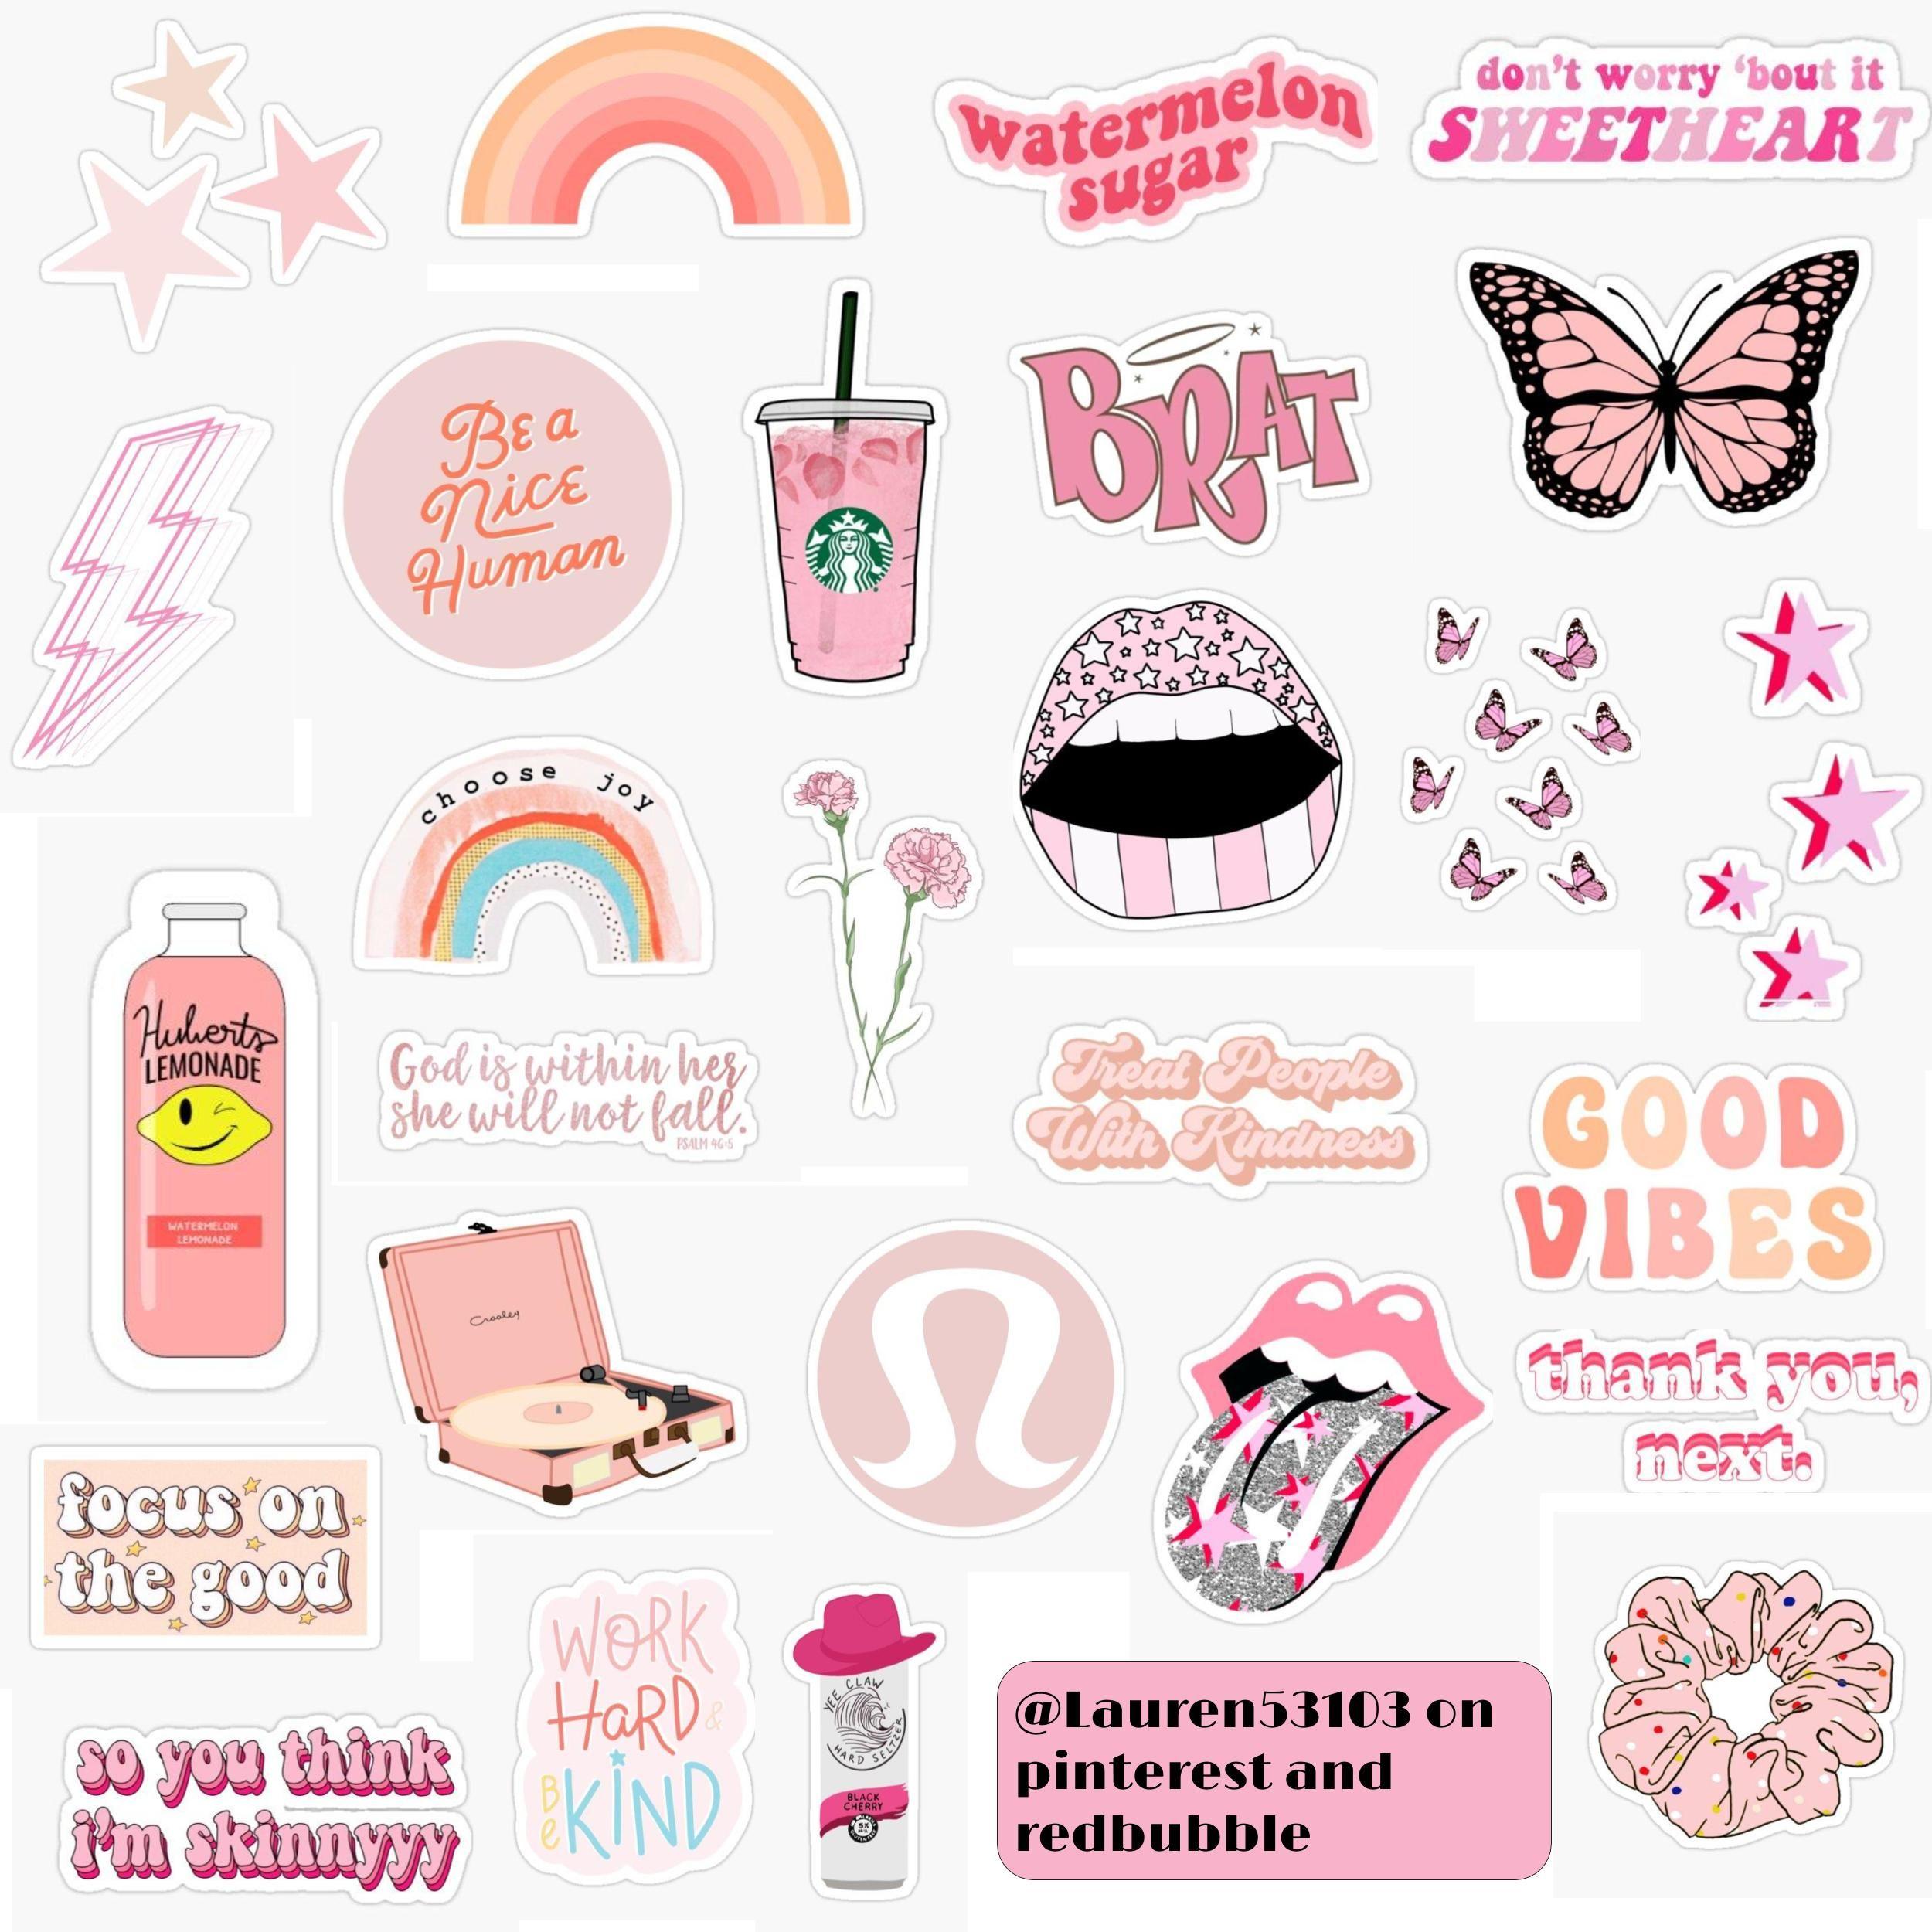 Pink Aesthetic Sticker Pack Sticker By Lauren53103 In 2020 Aesthetic Stickers Phone Case Stickers Printable Stickers